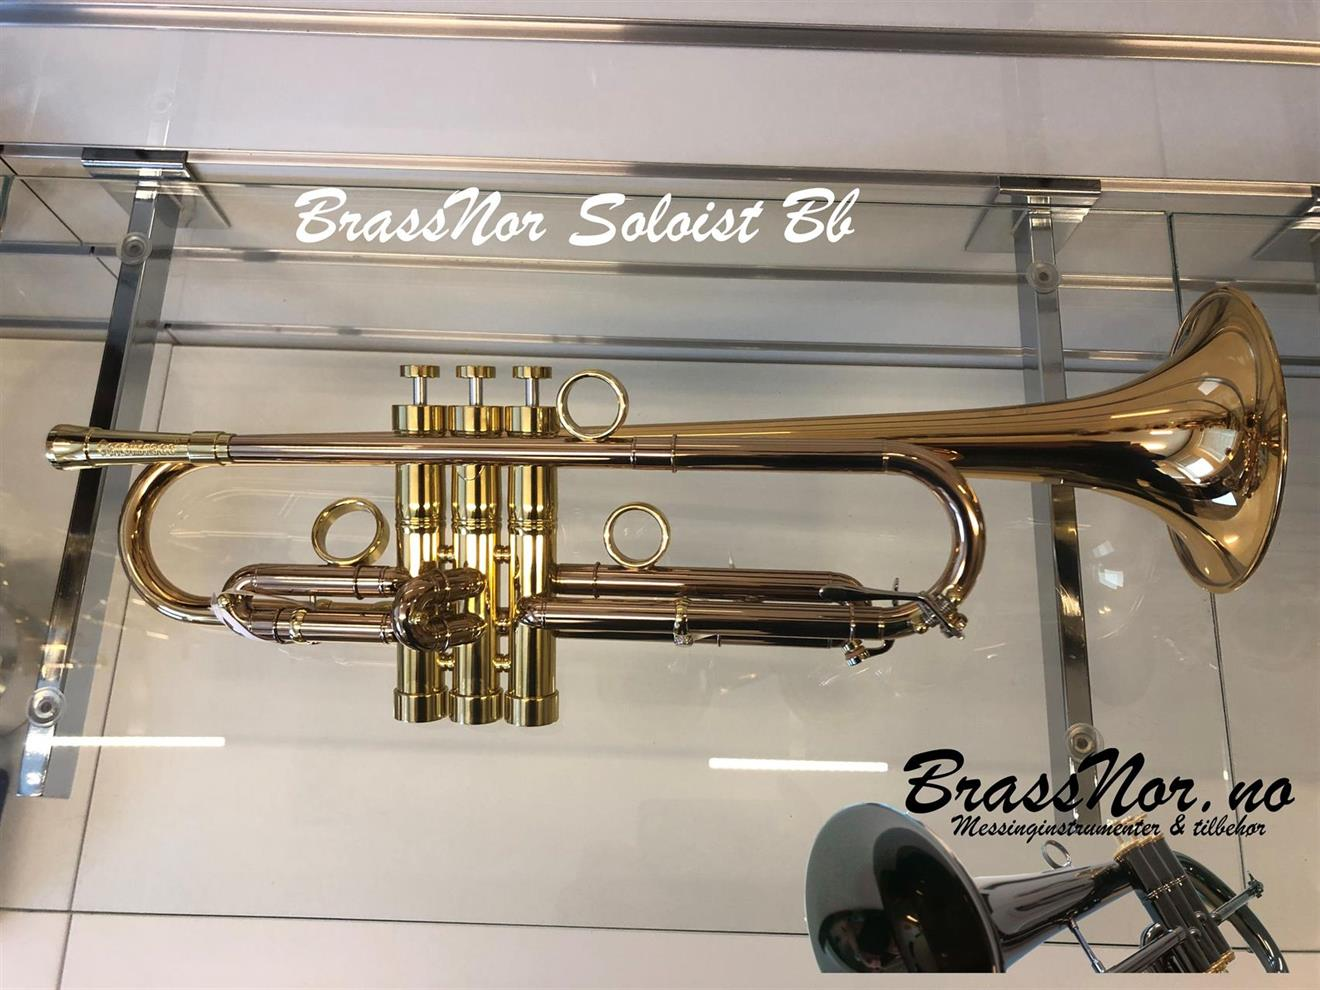 BrassNor Soloist 1110L GST trompet  lakkert